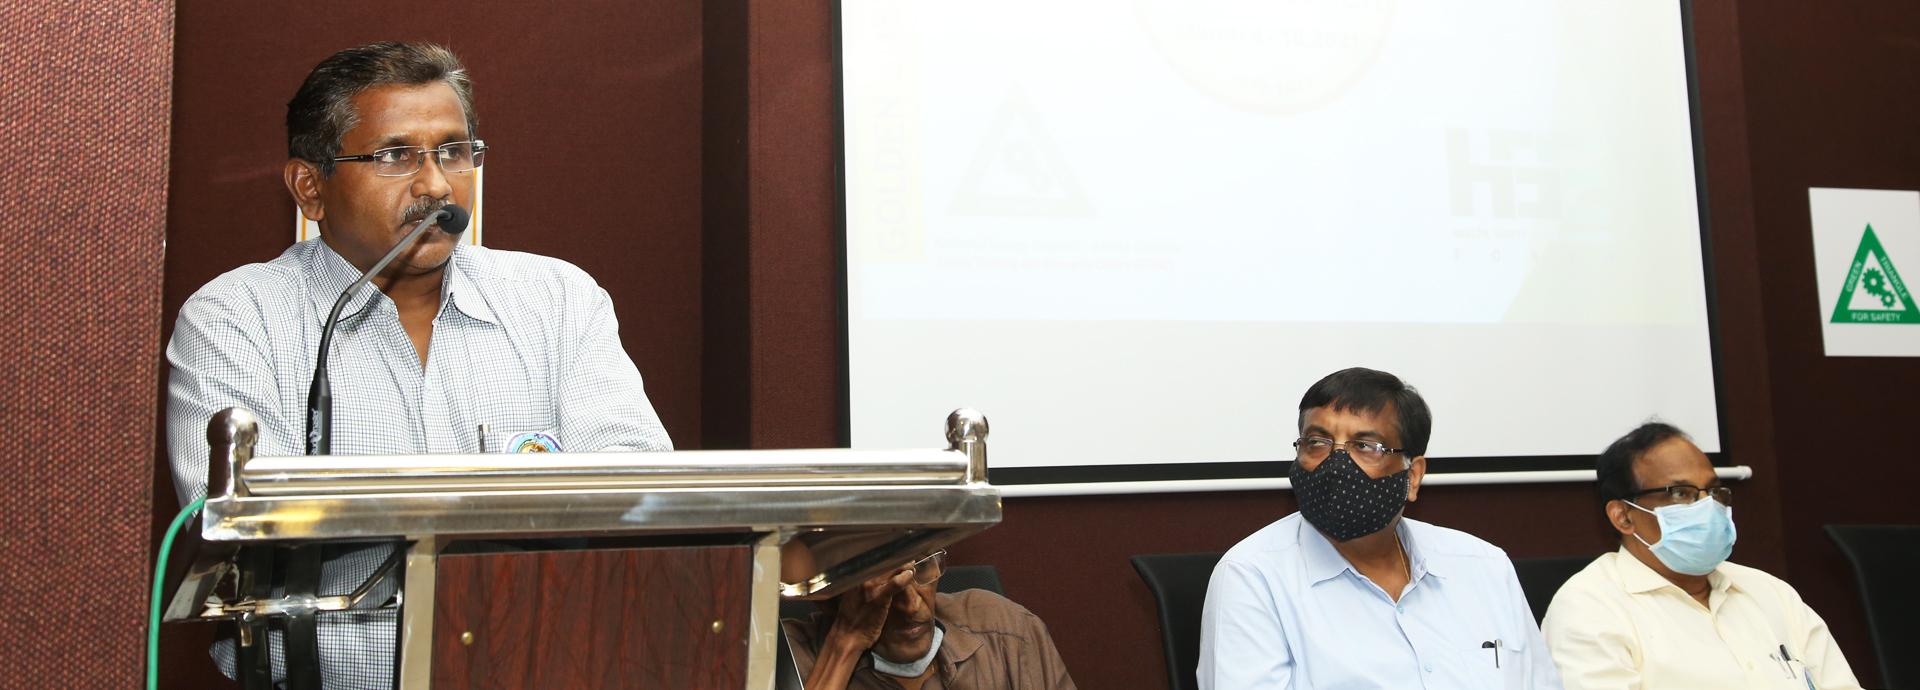 Presidential Address by: Shri. P Pramod